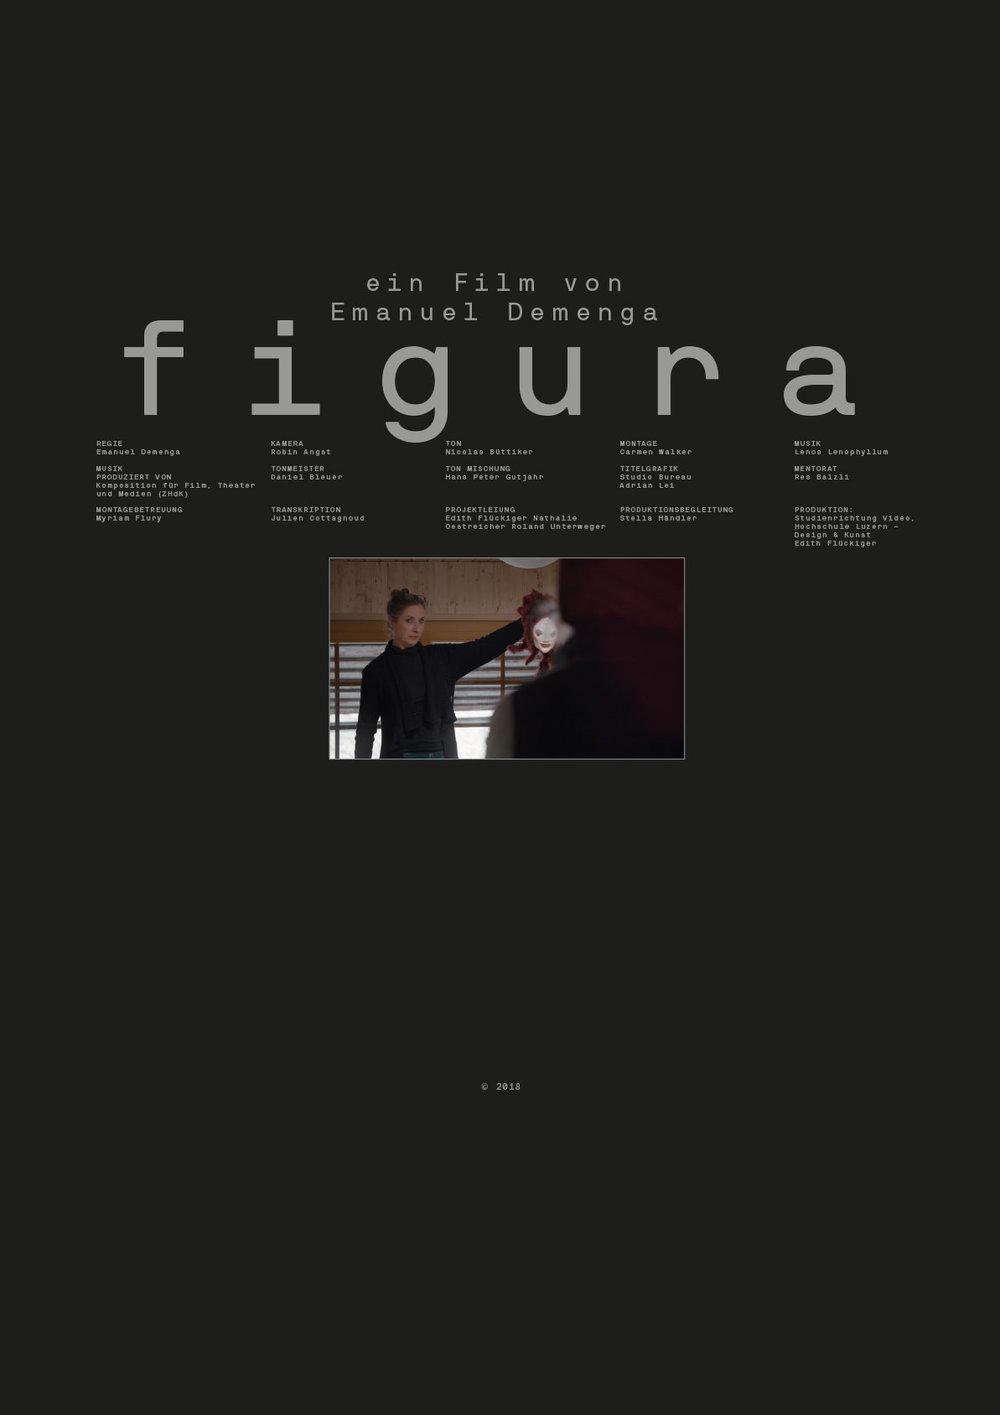 FIGURA_Poster.jpg